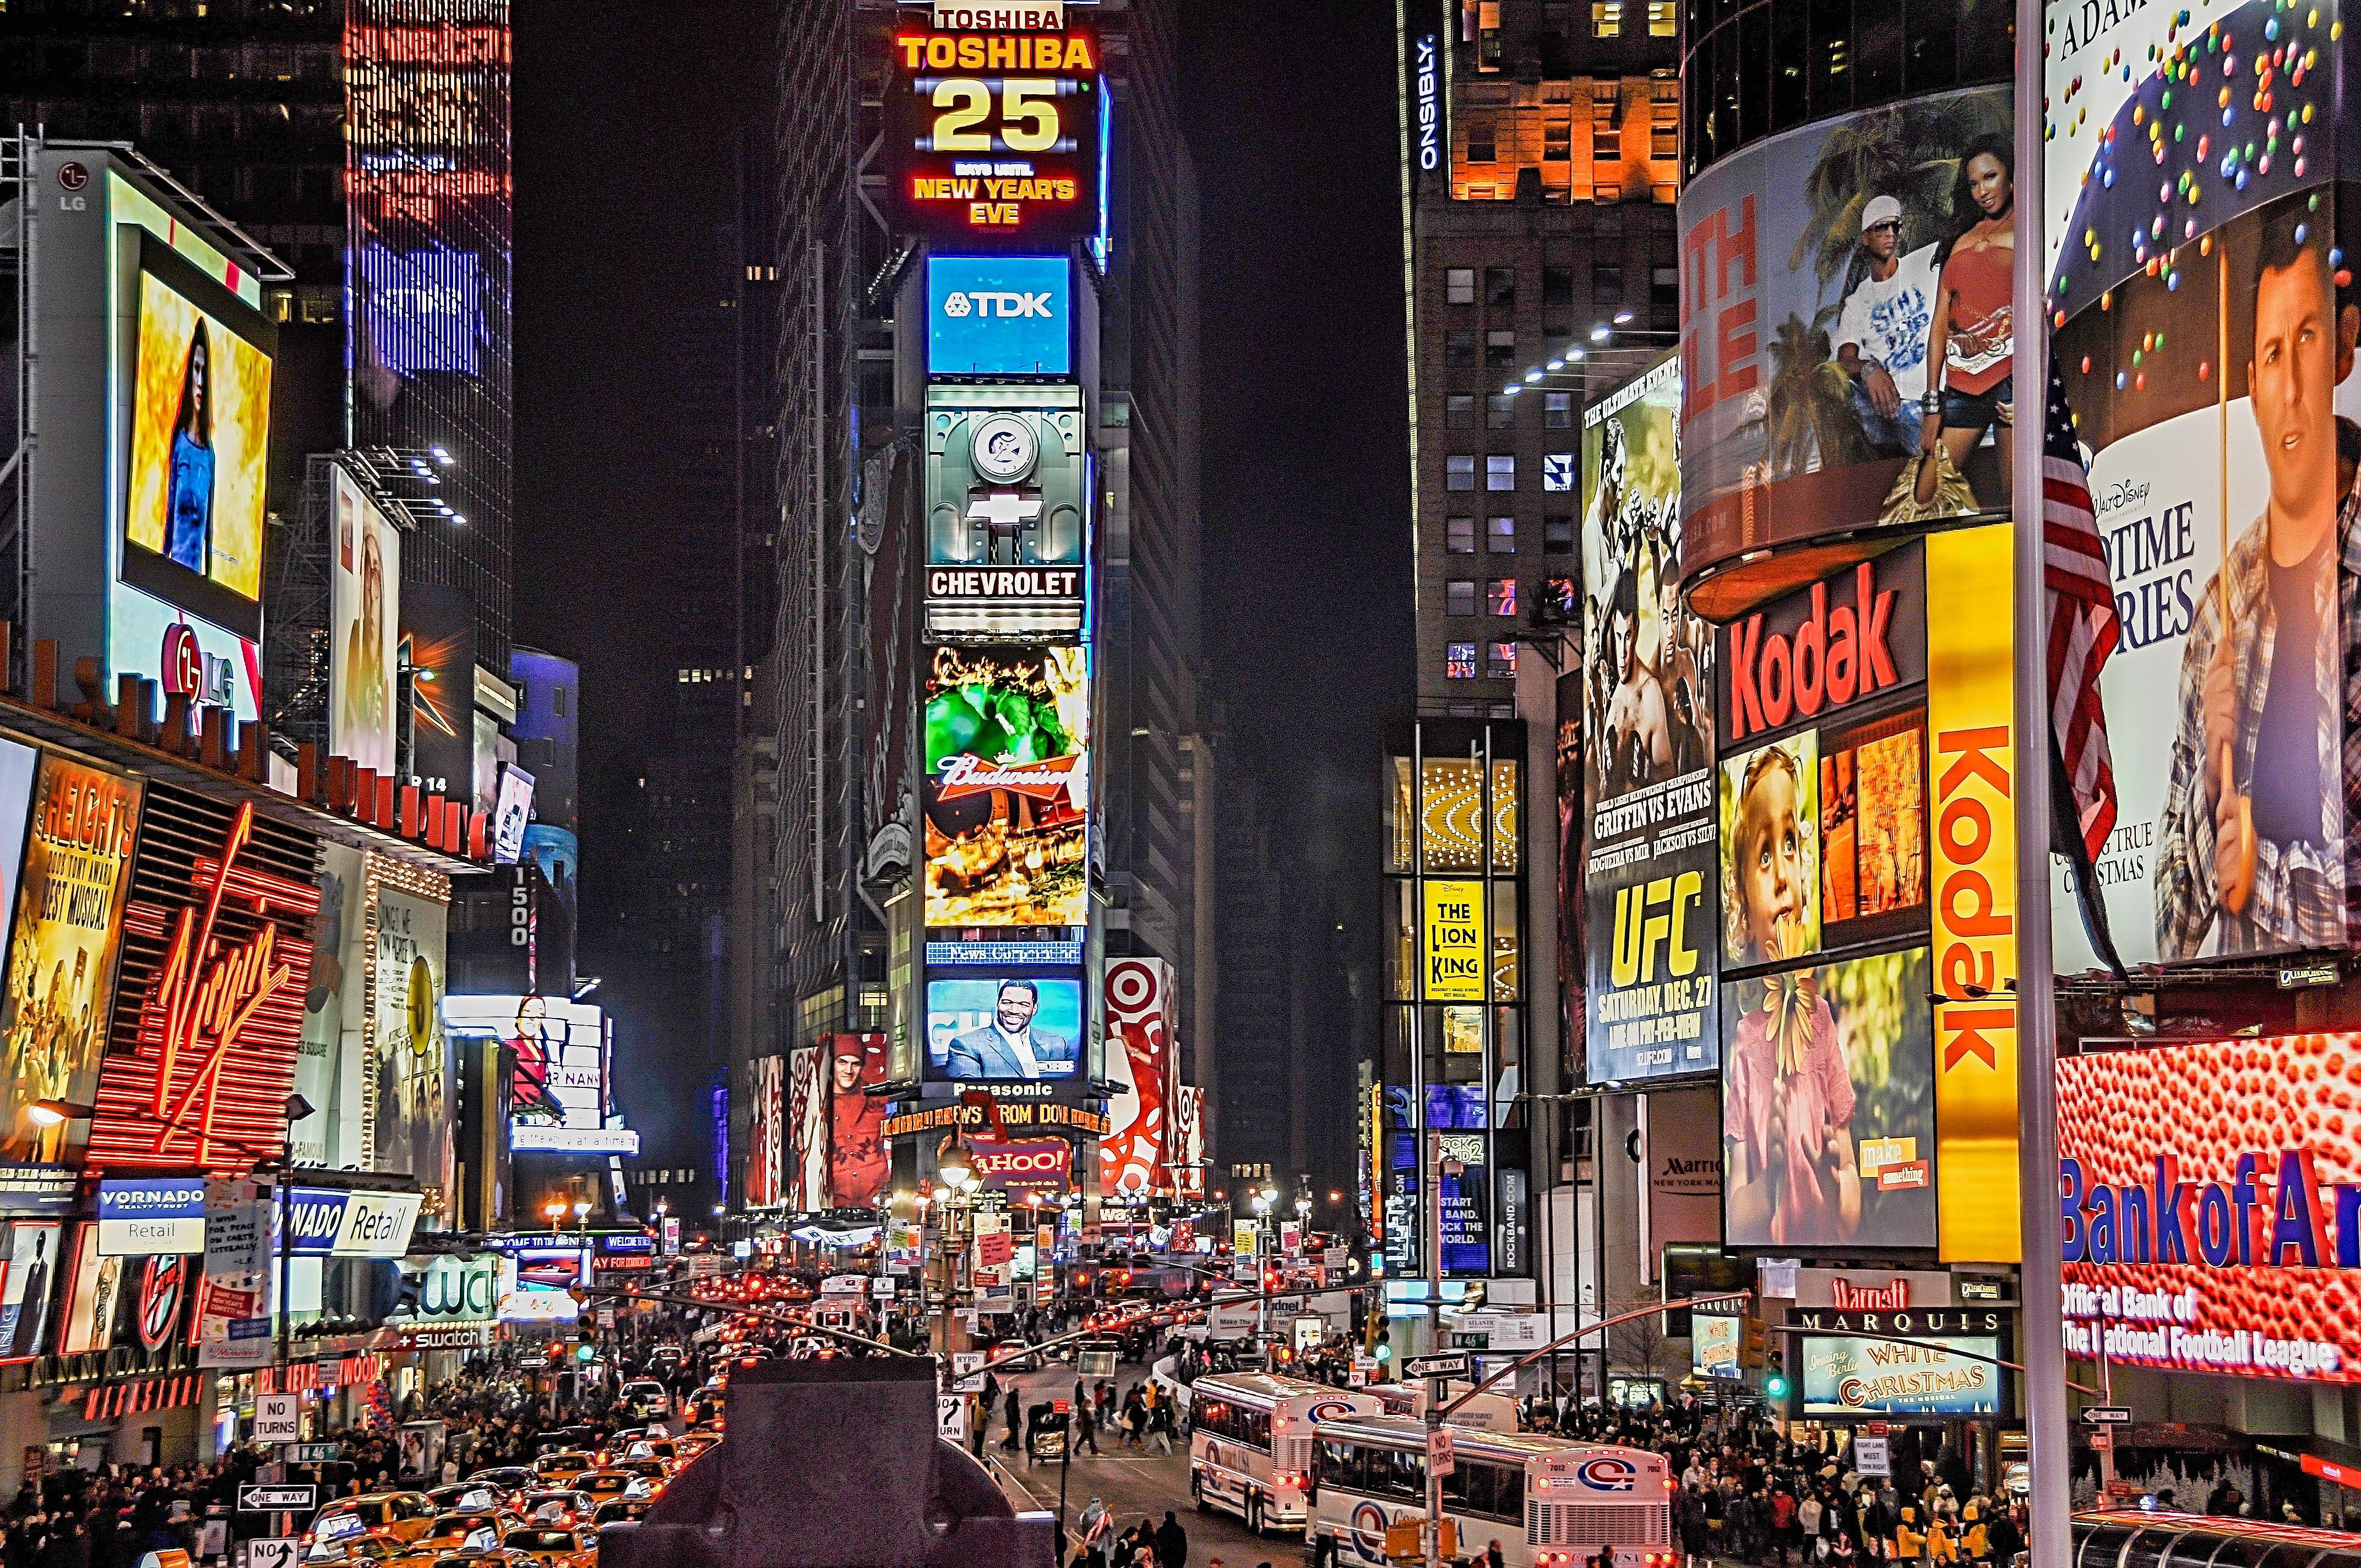 ads-architecture-billboards-802024